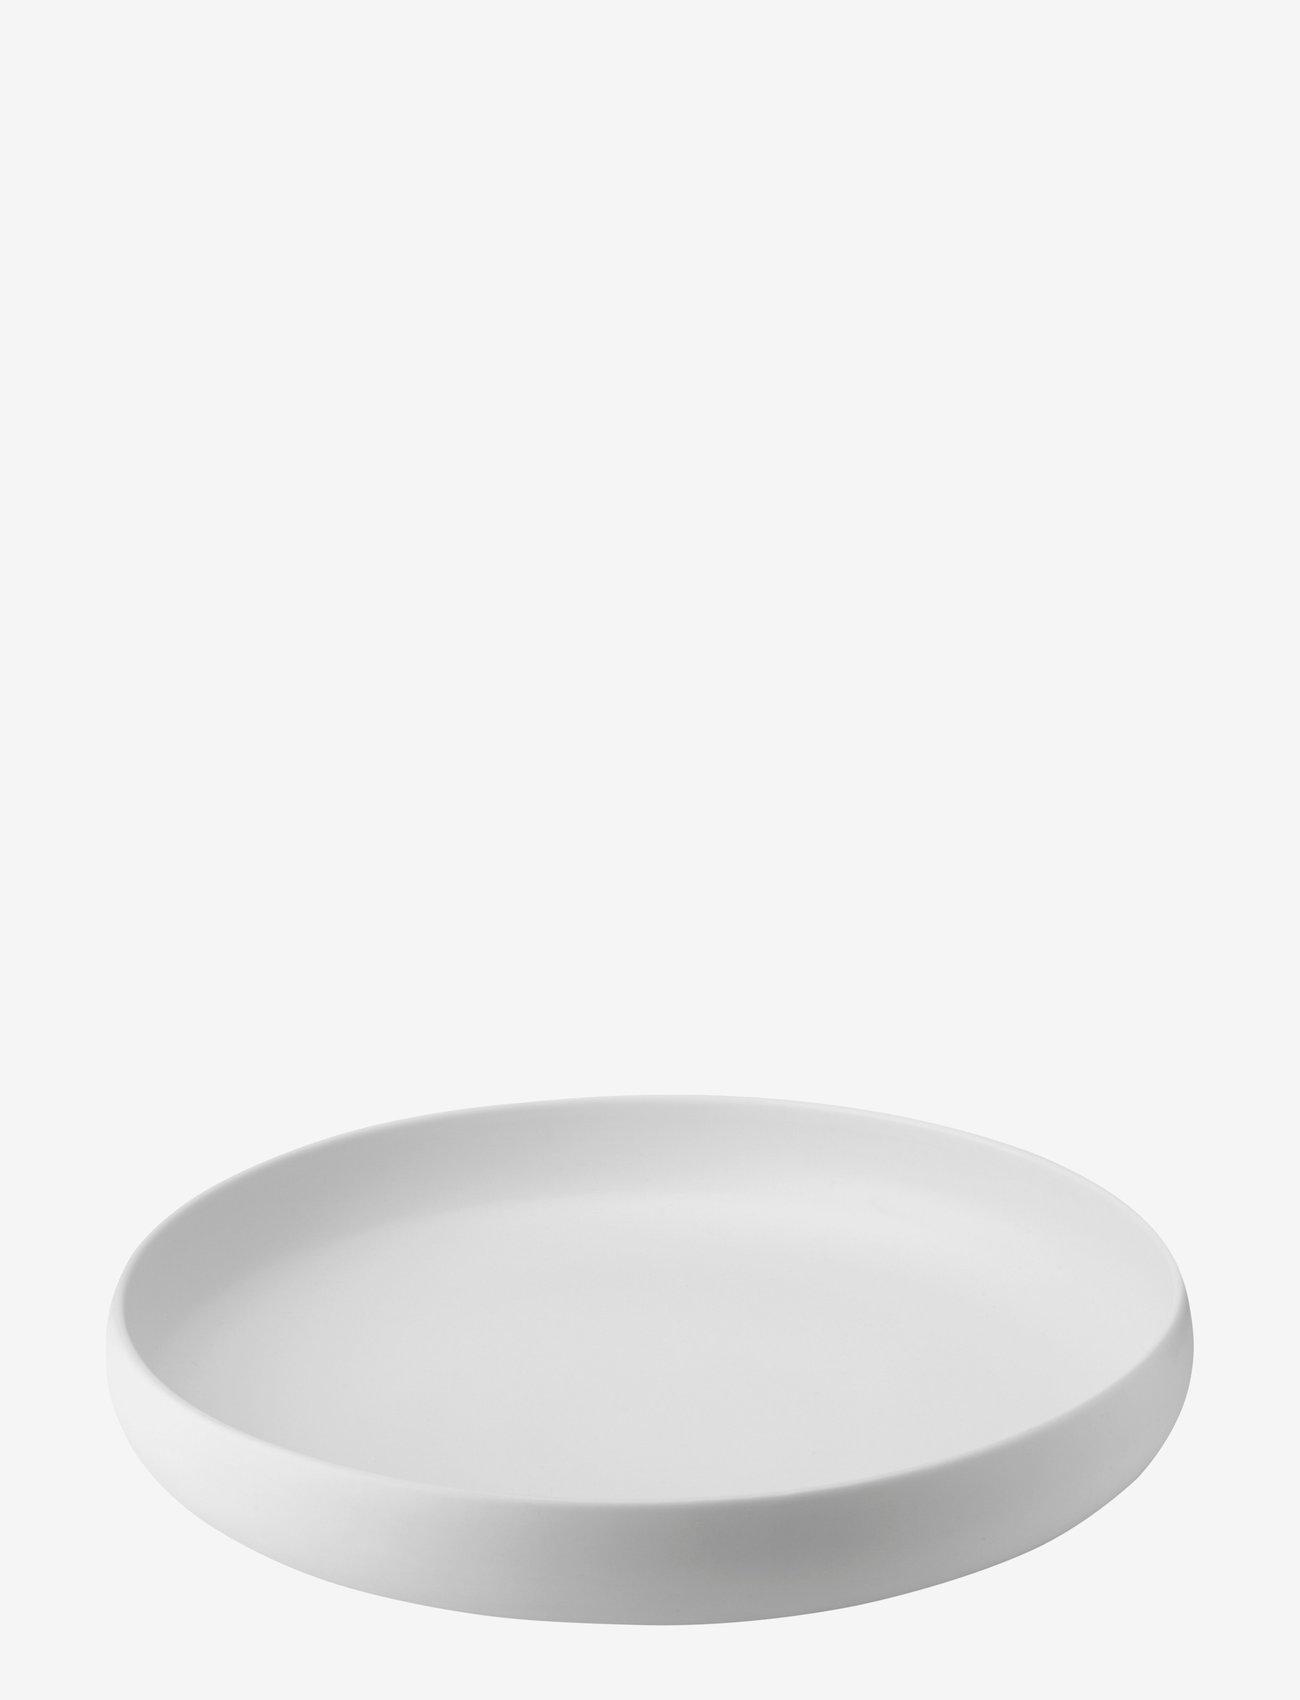 Knabstrup Keramik - Earth fat - serveringsfat - chalk white - 0